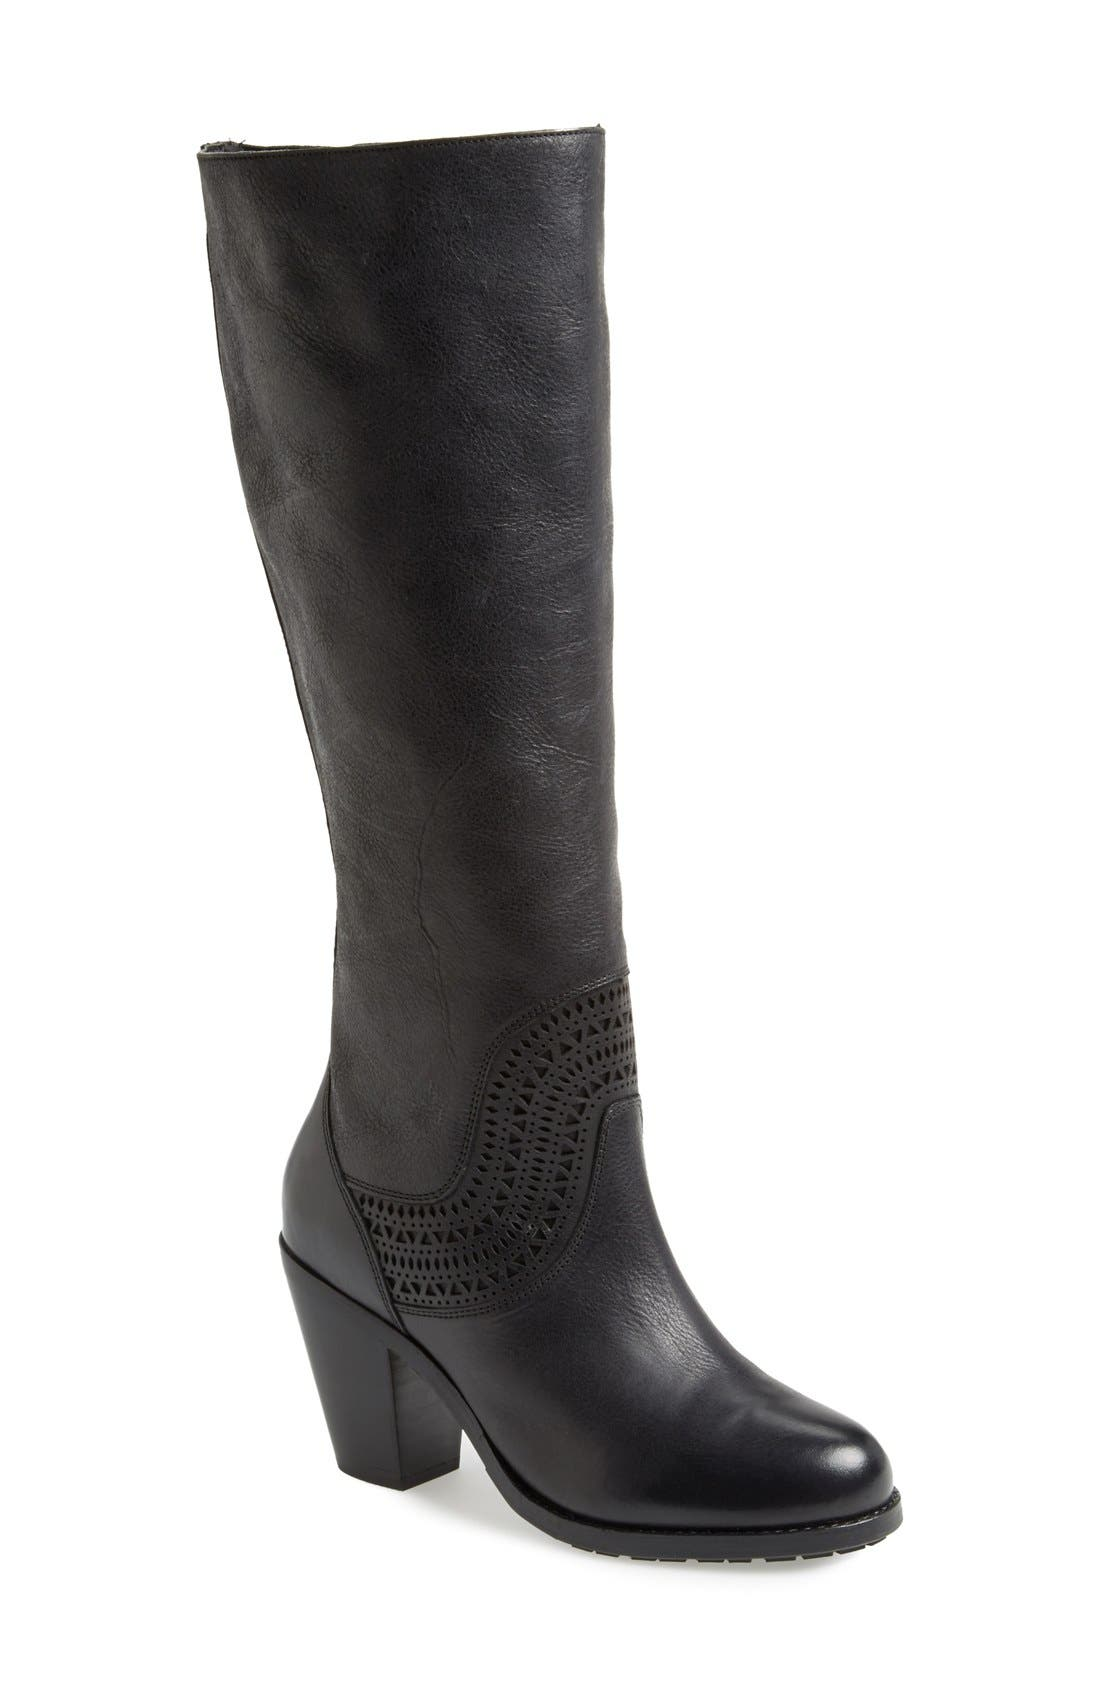 Alternate Image 1 Selected - Ariat 'Sundown' Tall Boot (Women)